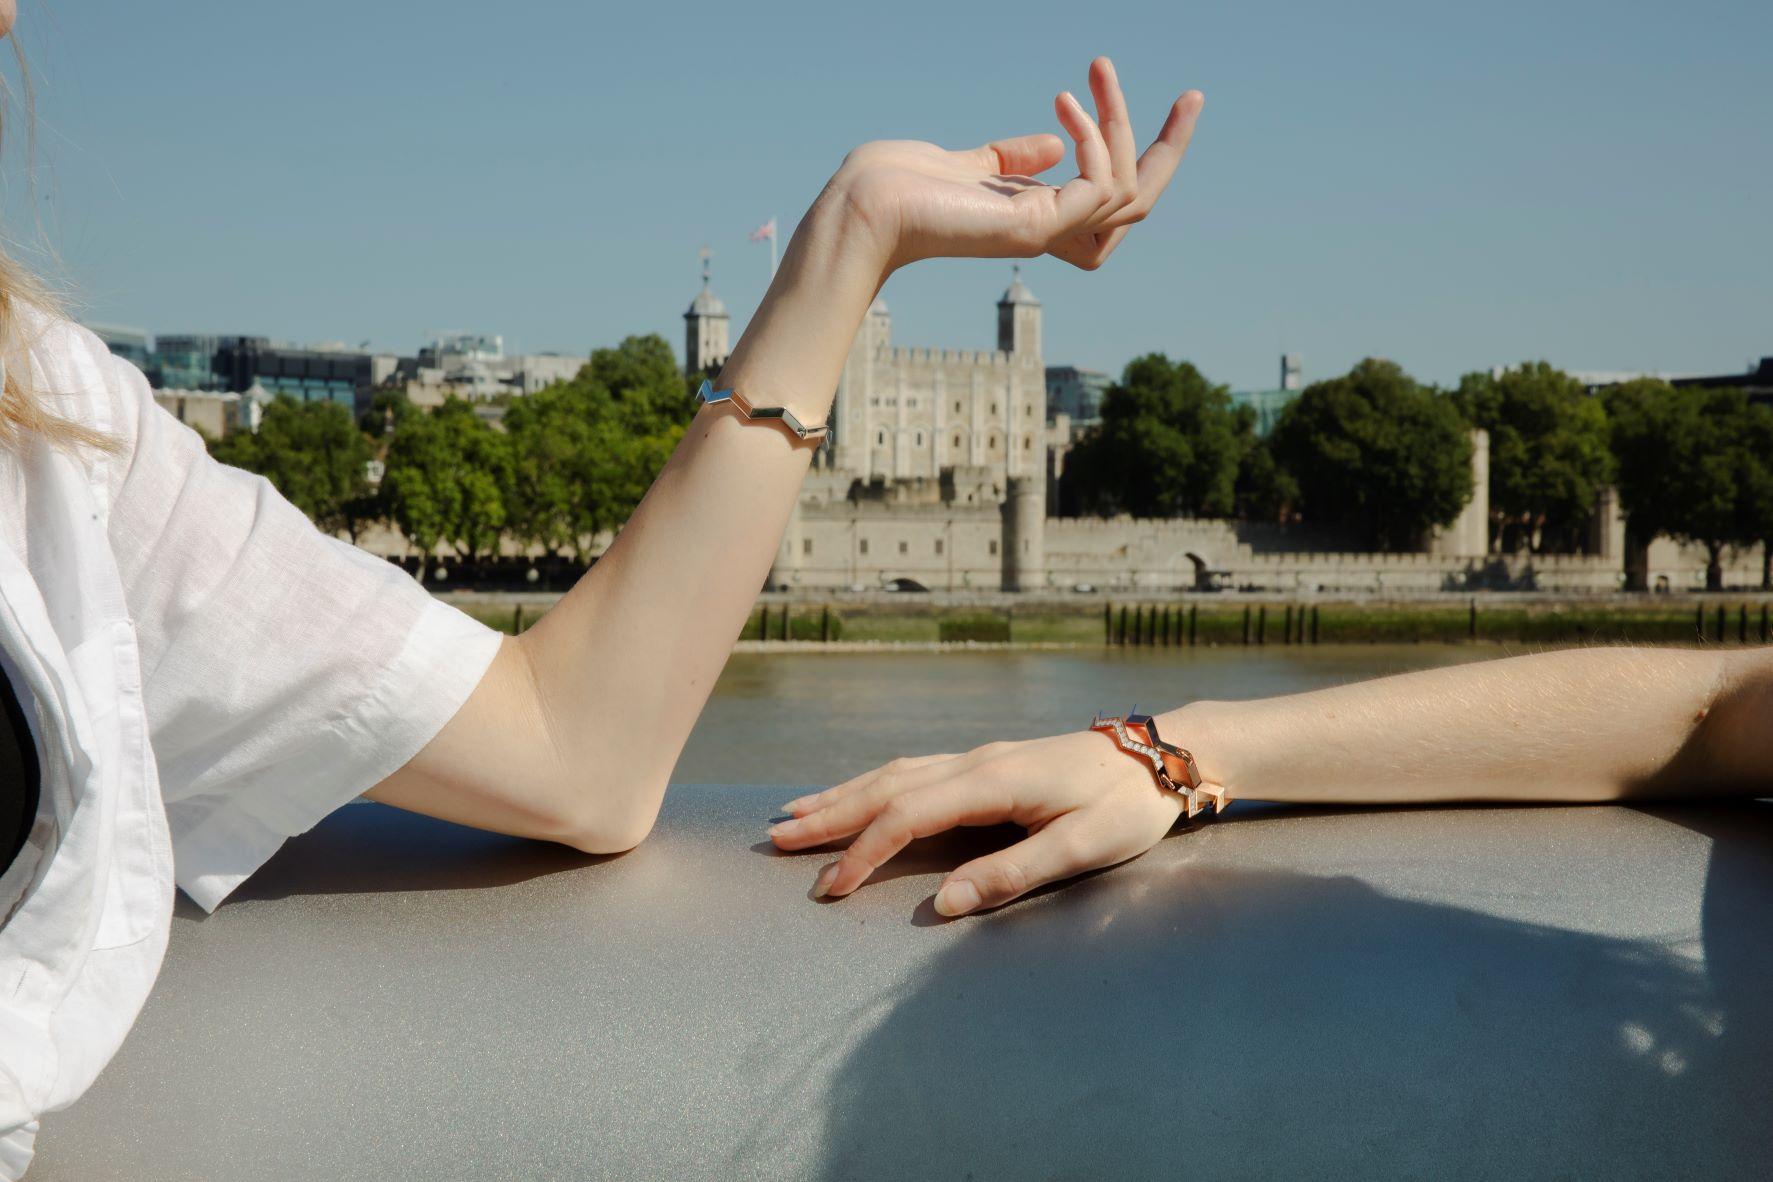 Models wearing all we are Oceano bracelets in the sunshine